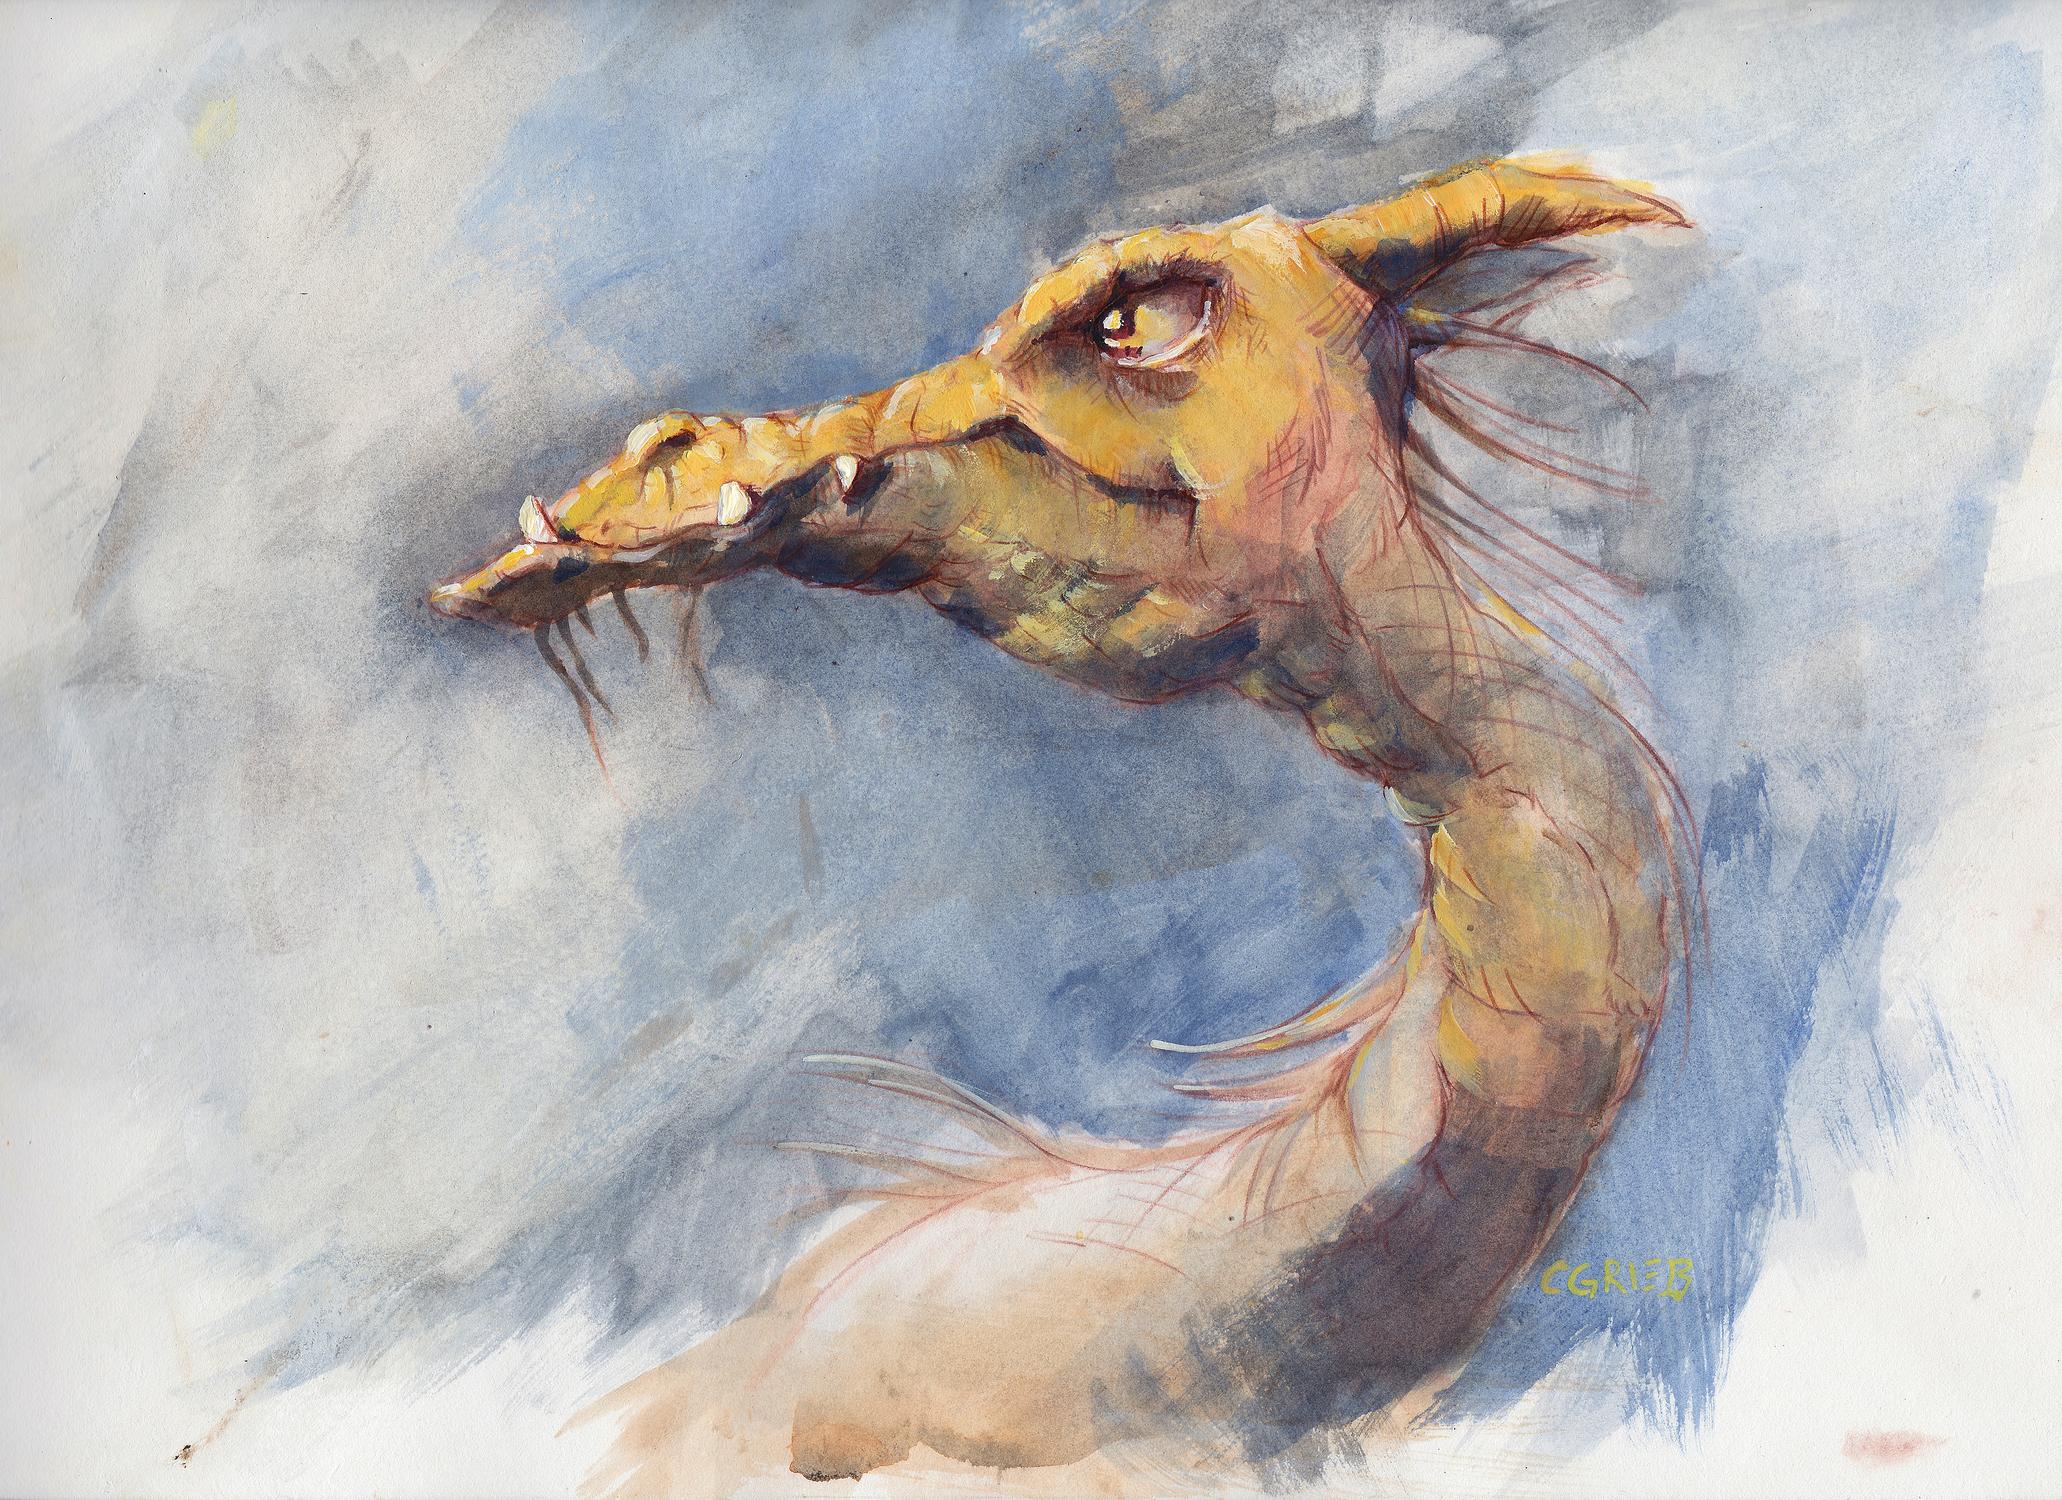 Dragon Artwork by Chuck Grieb